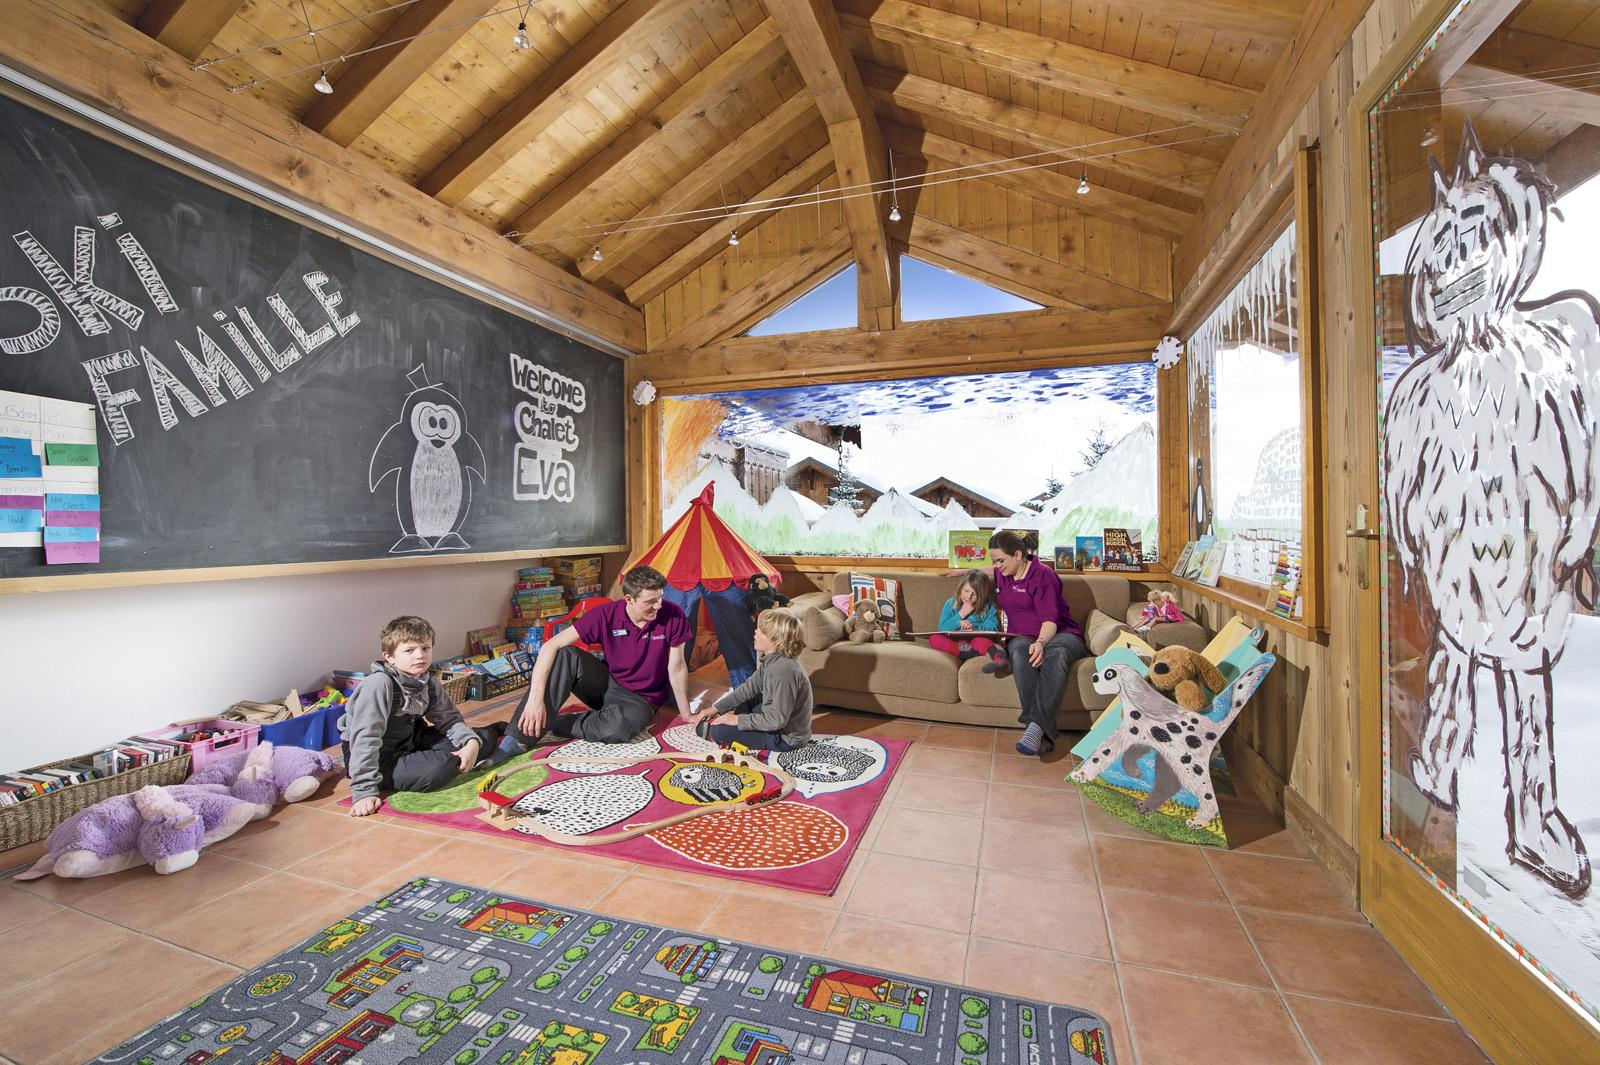 Chalet Eva Playroom